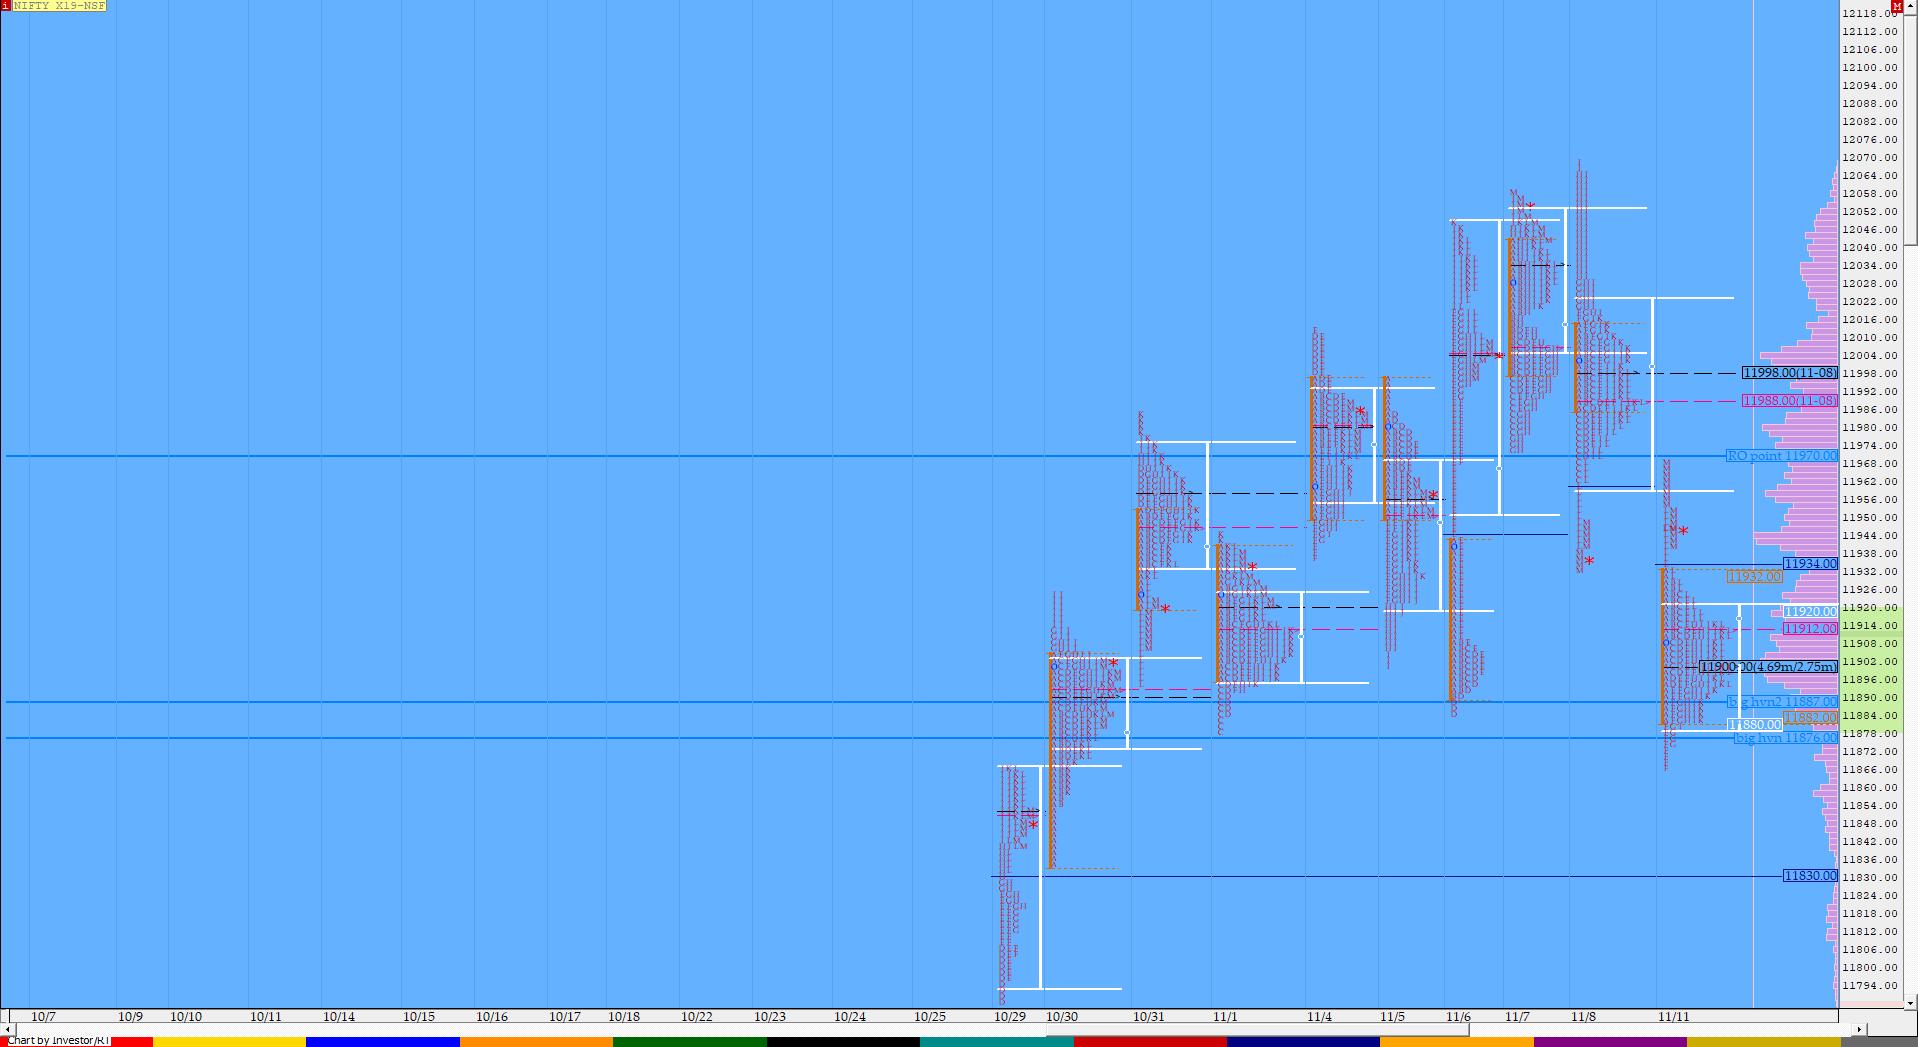 Market Profile Analysis dated 11th November 2